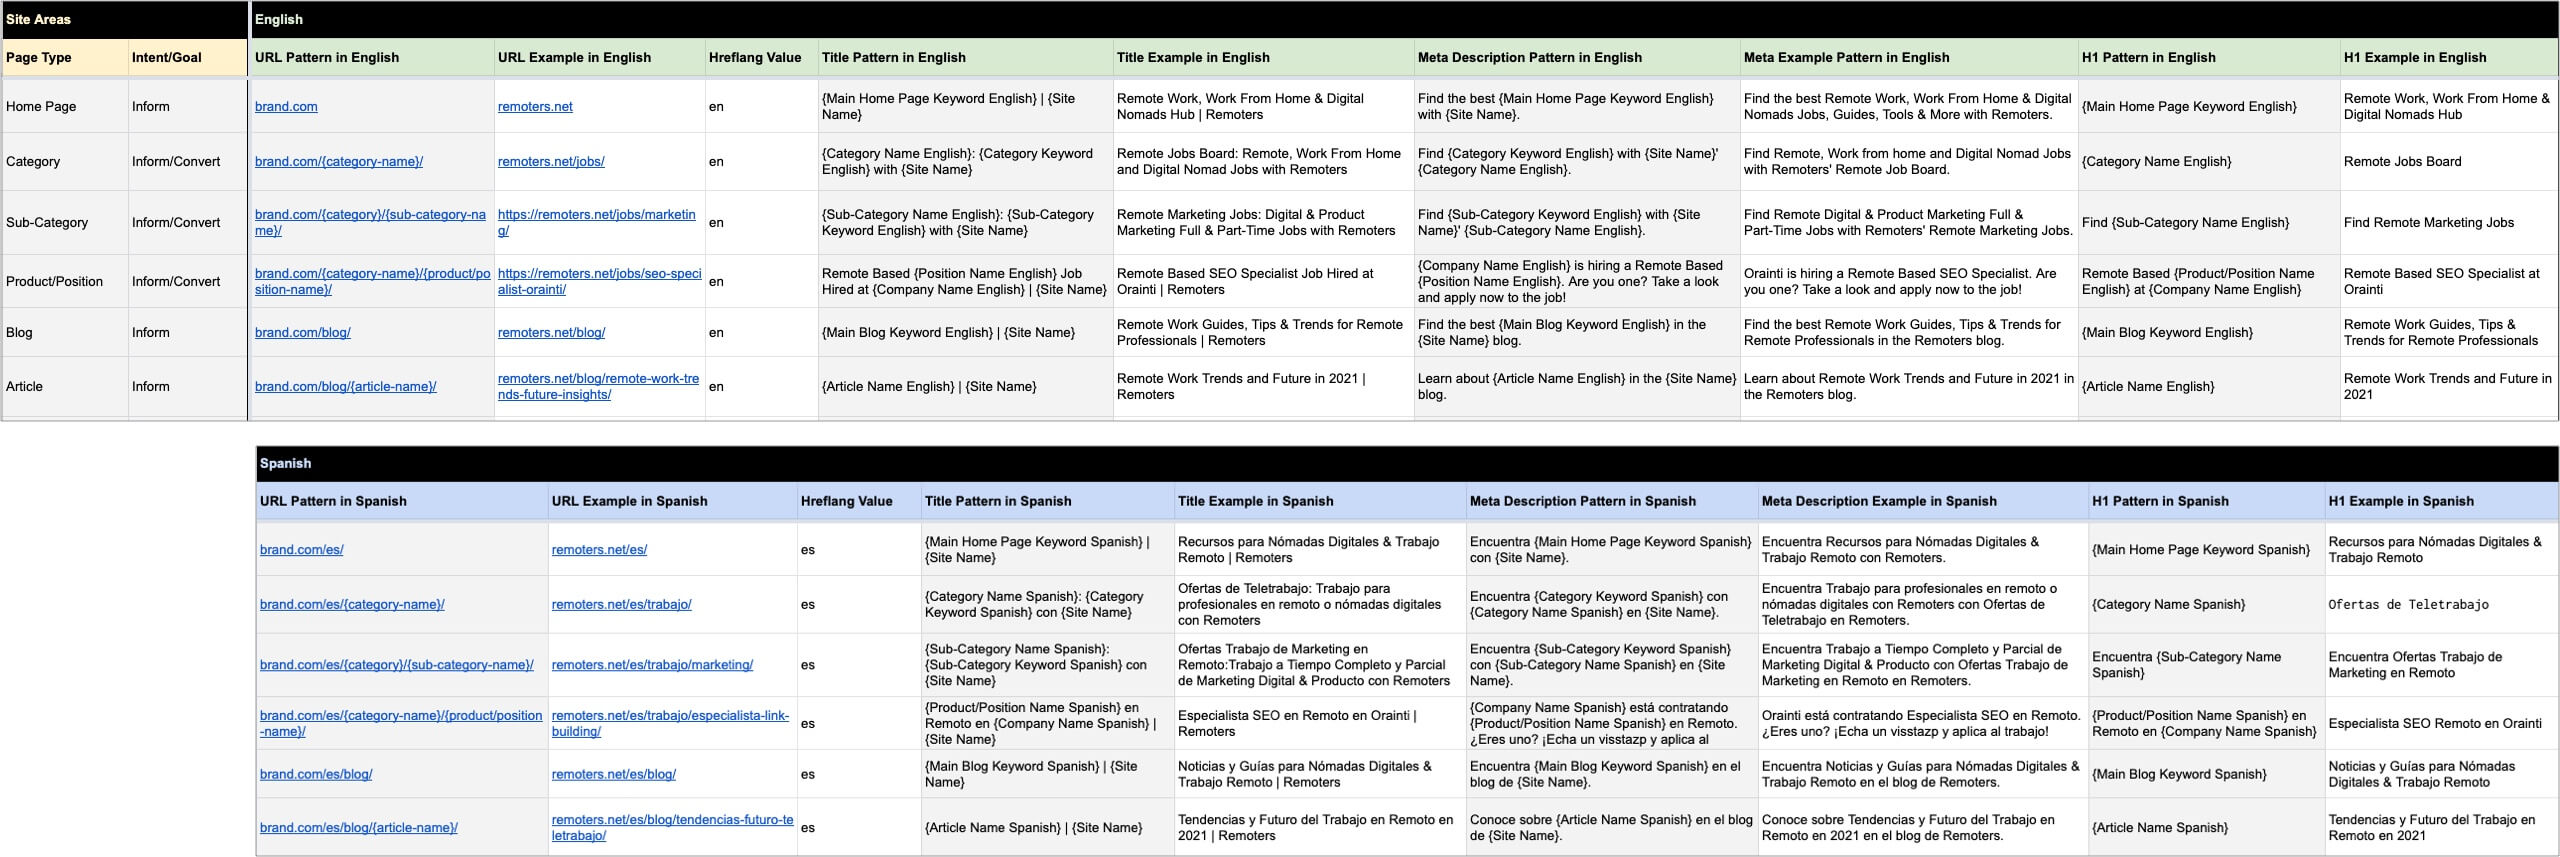 International SEO - Metadata Patterns Per Page Types